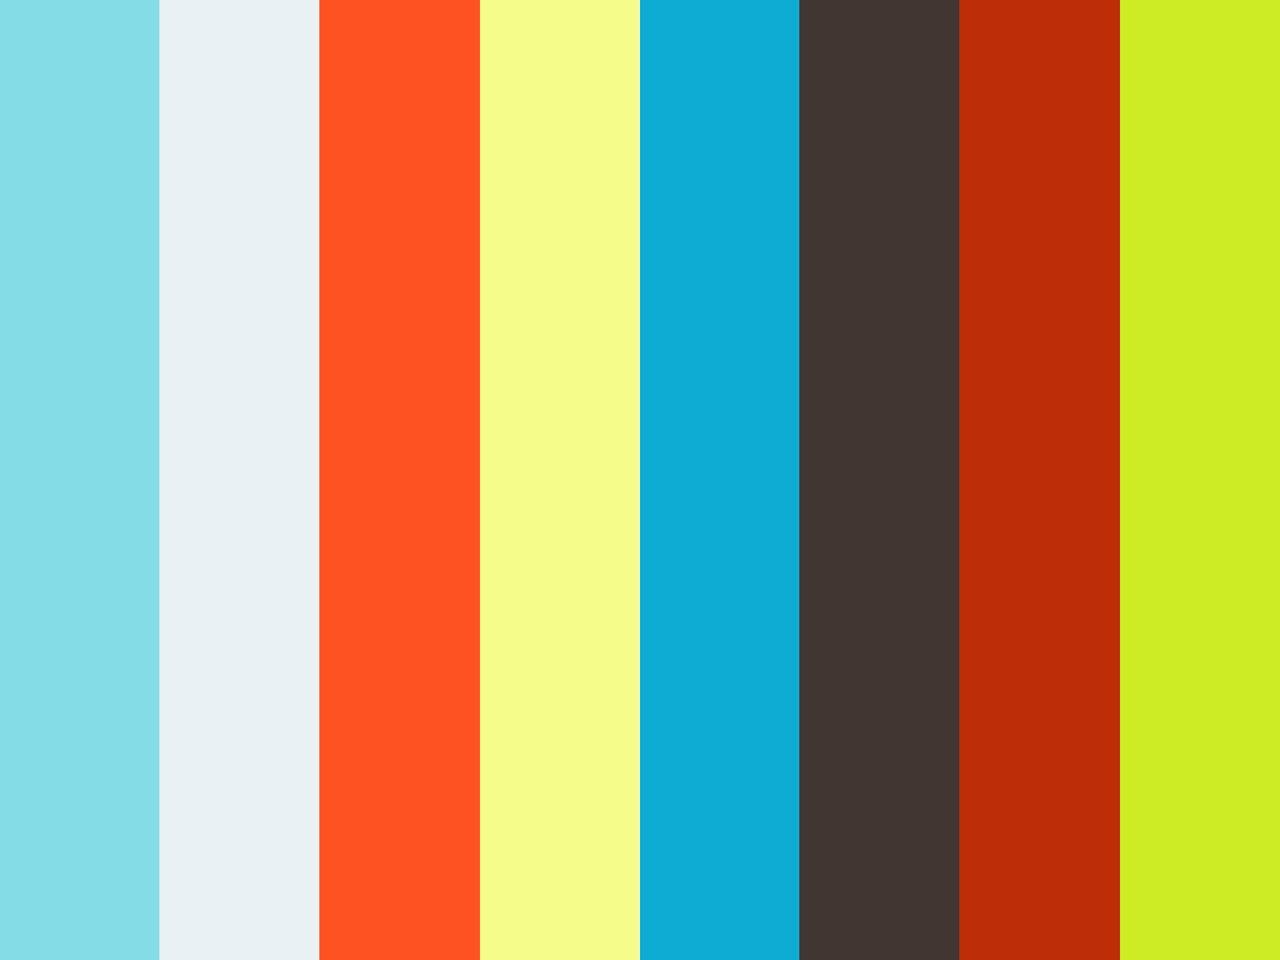 David 'Elsewhere' Bernal - Kollaboration '01